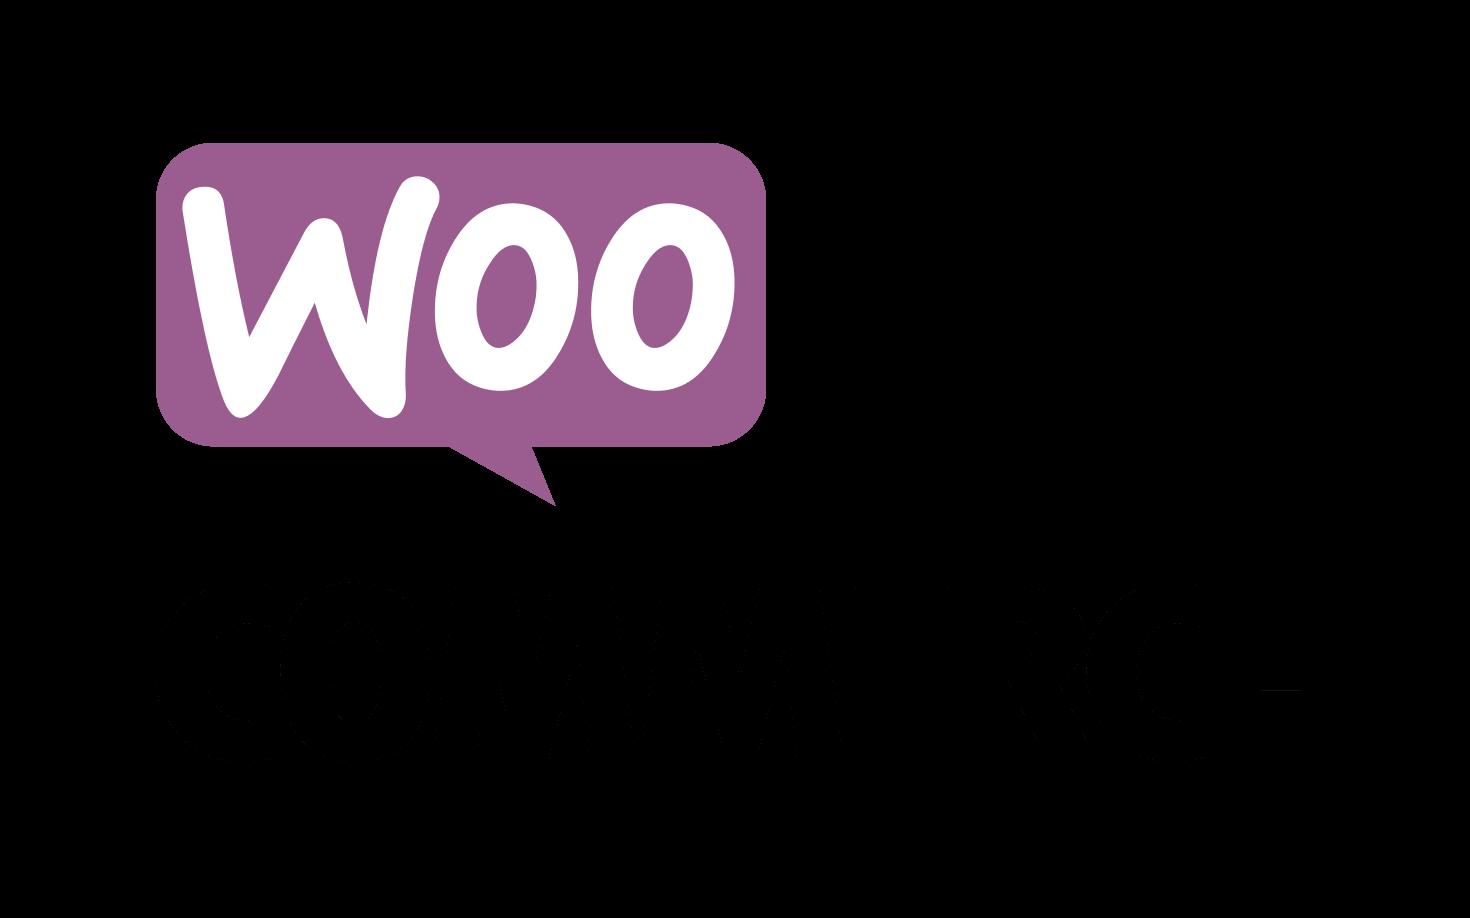 Mint Media | Website Design & Development - We use Woocommerce and Wordpress for our e-commerce development.